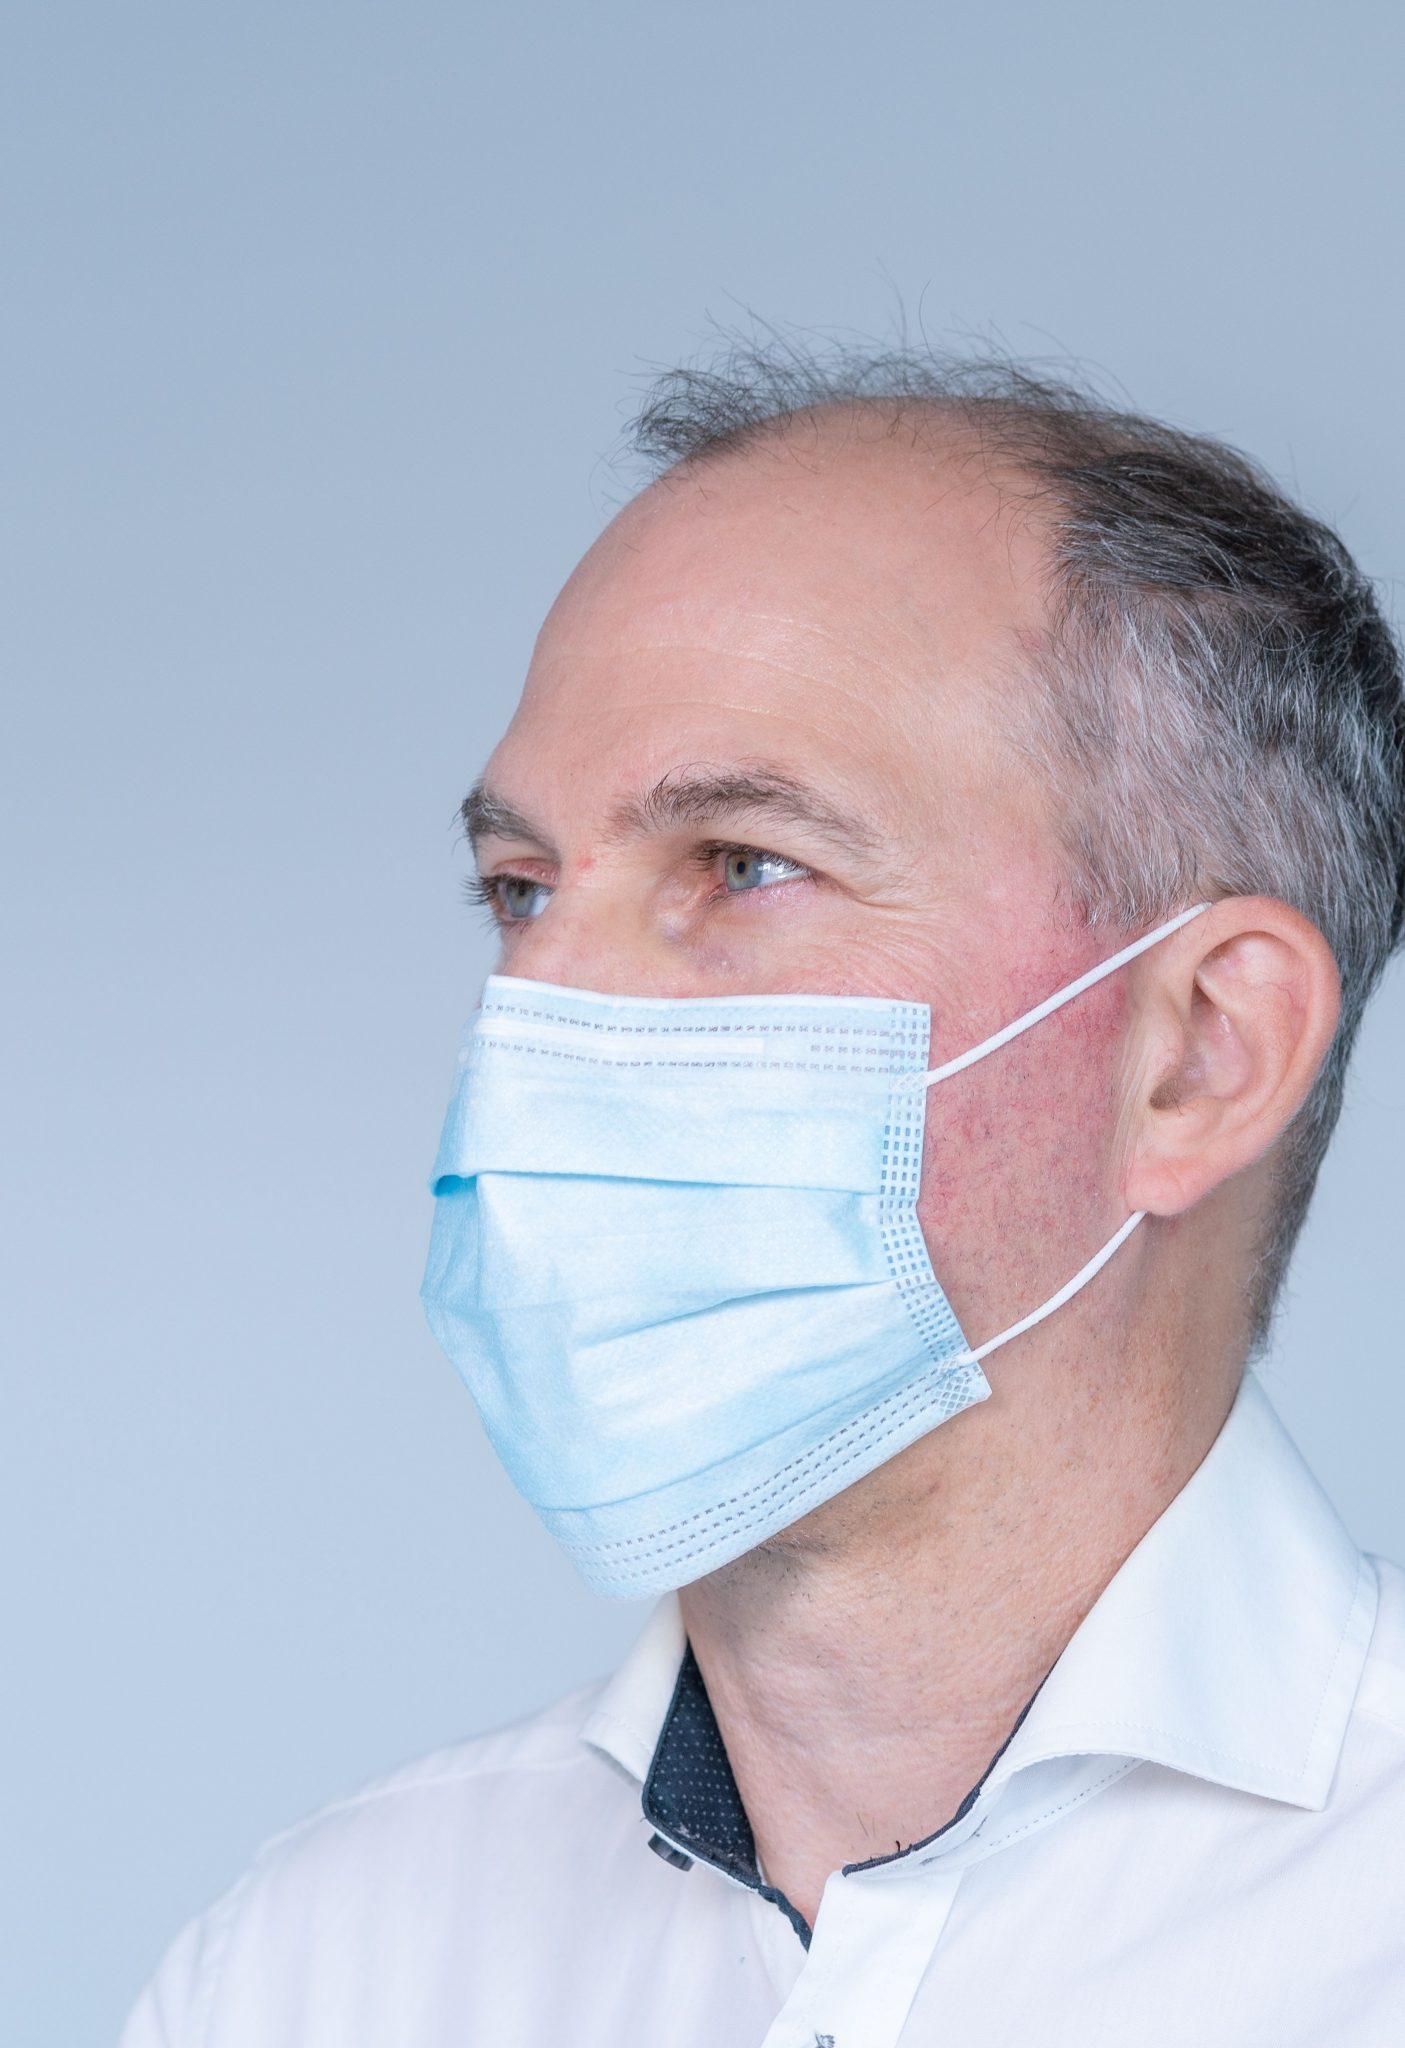 Man in a blue medical mask